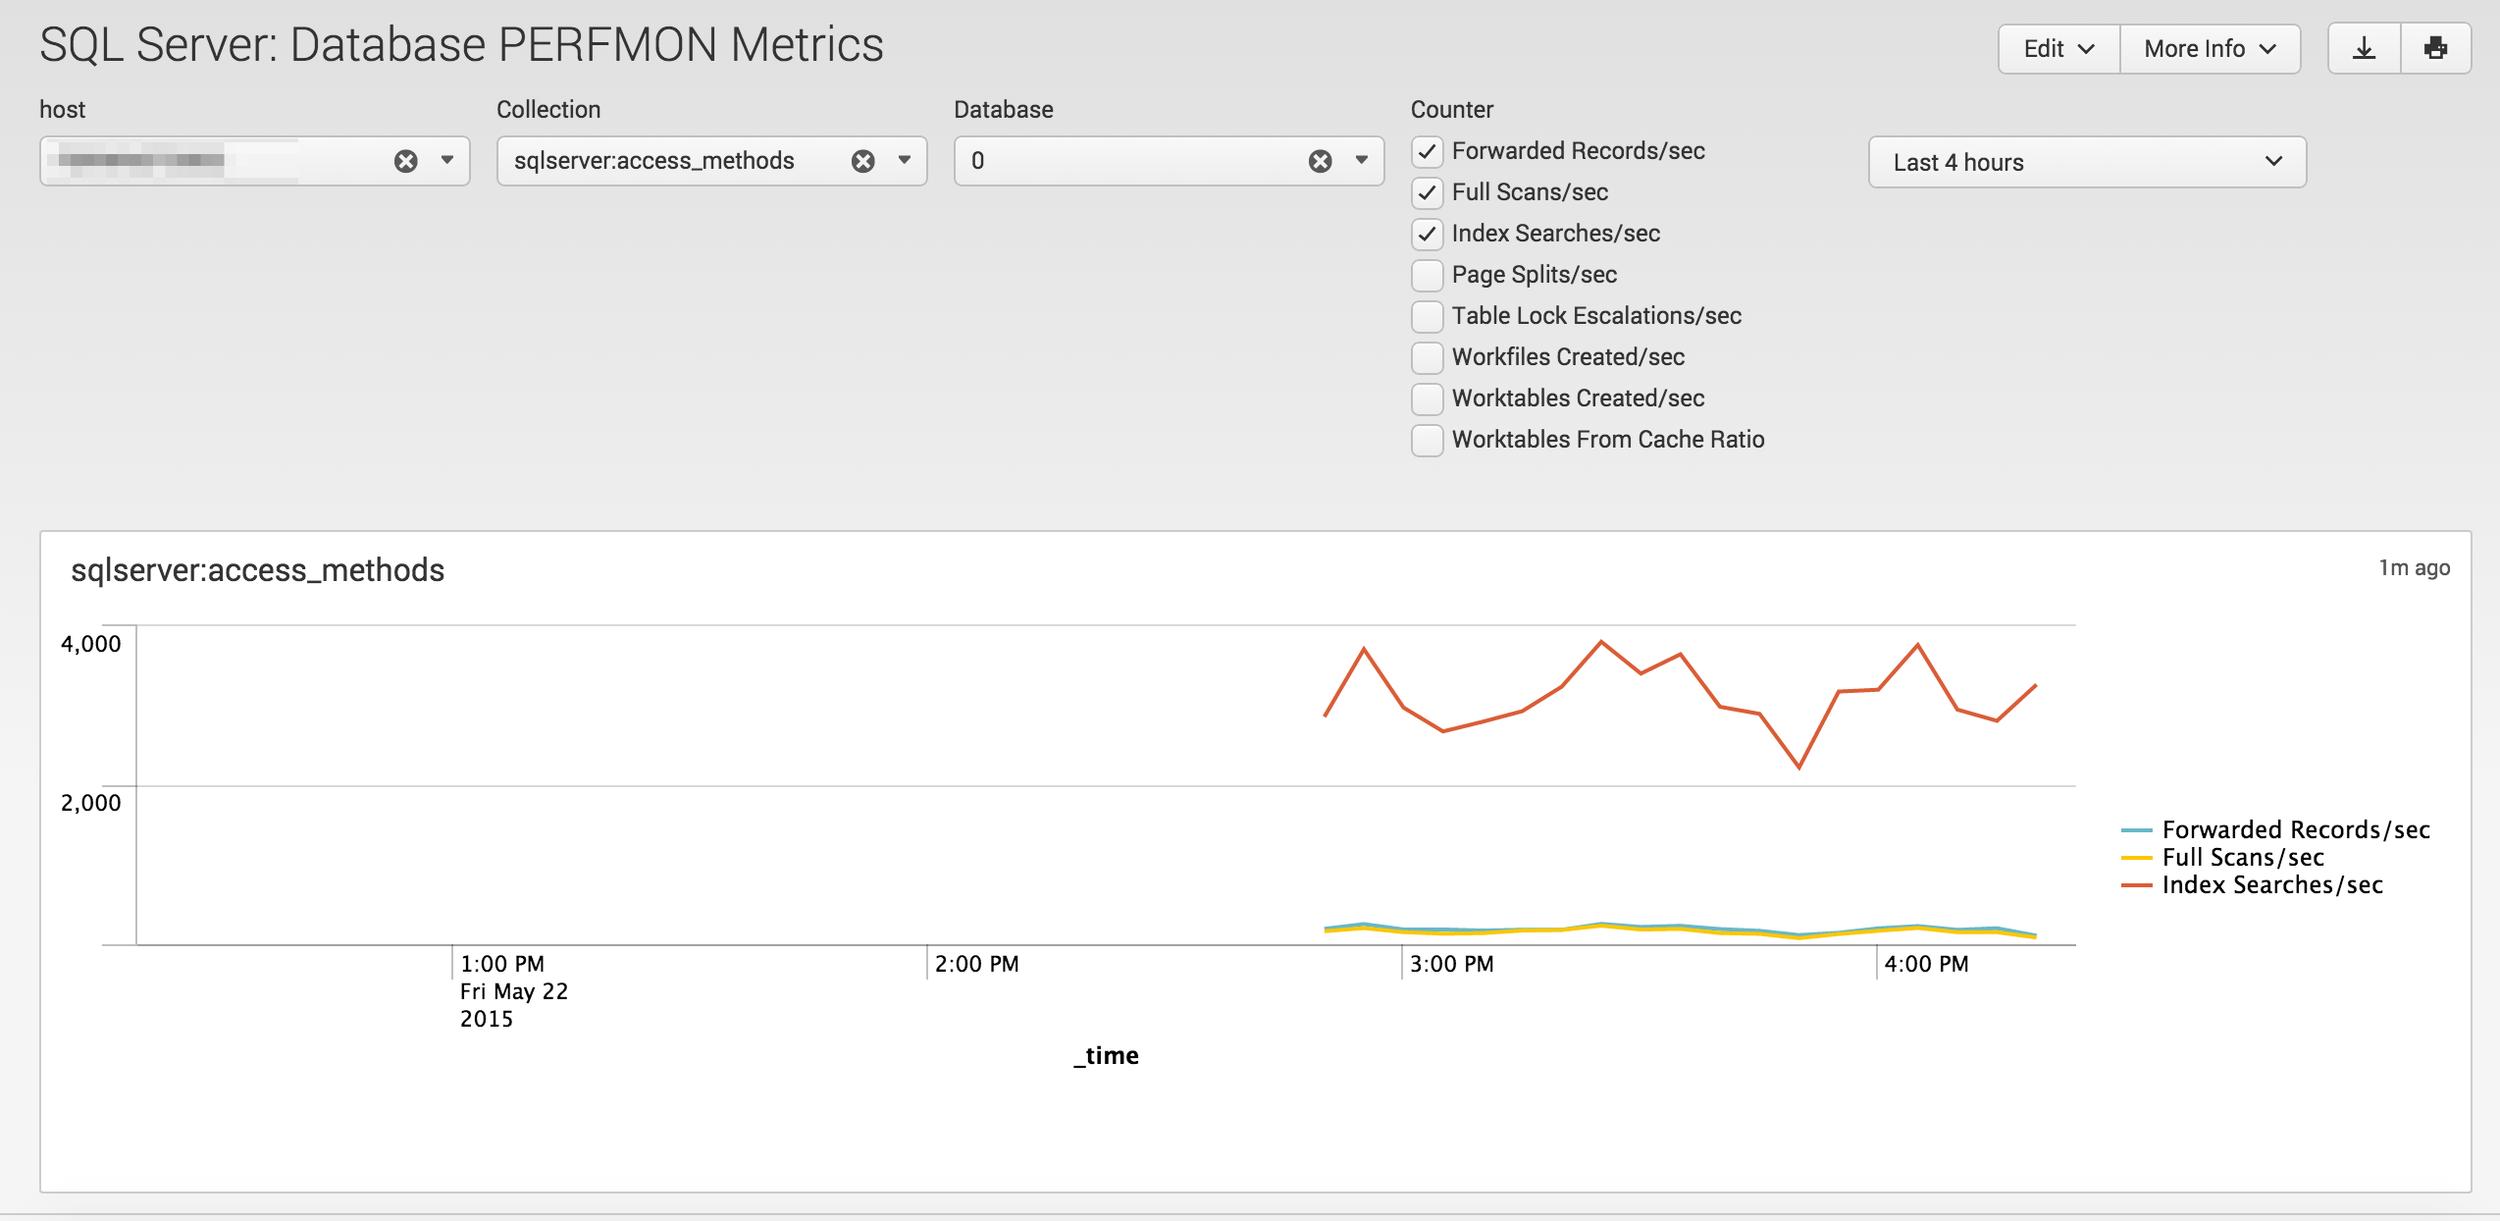 Lifting The Lid On SQL Server Performance Using Splunk — GODS OF DATA